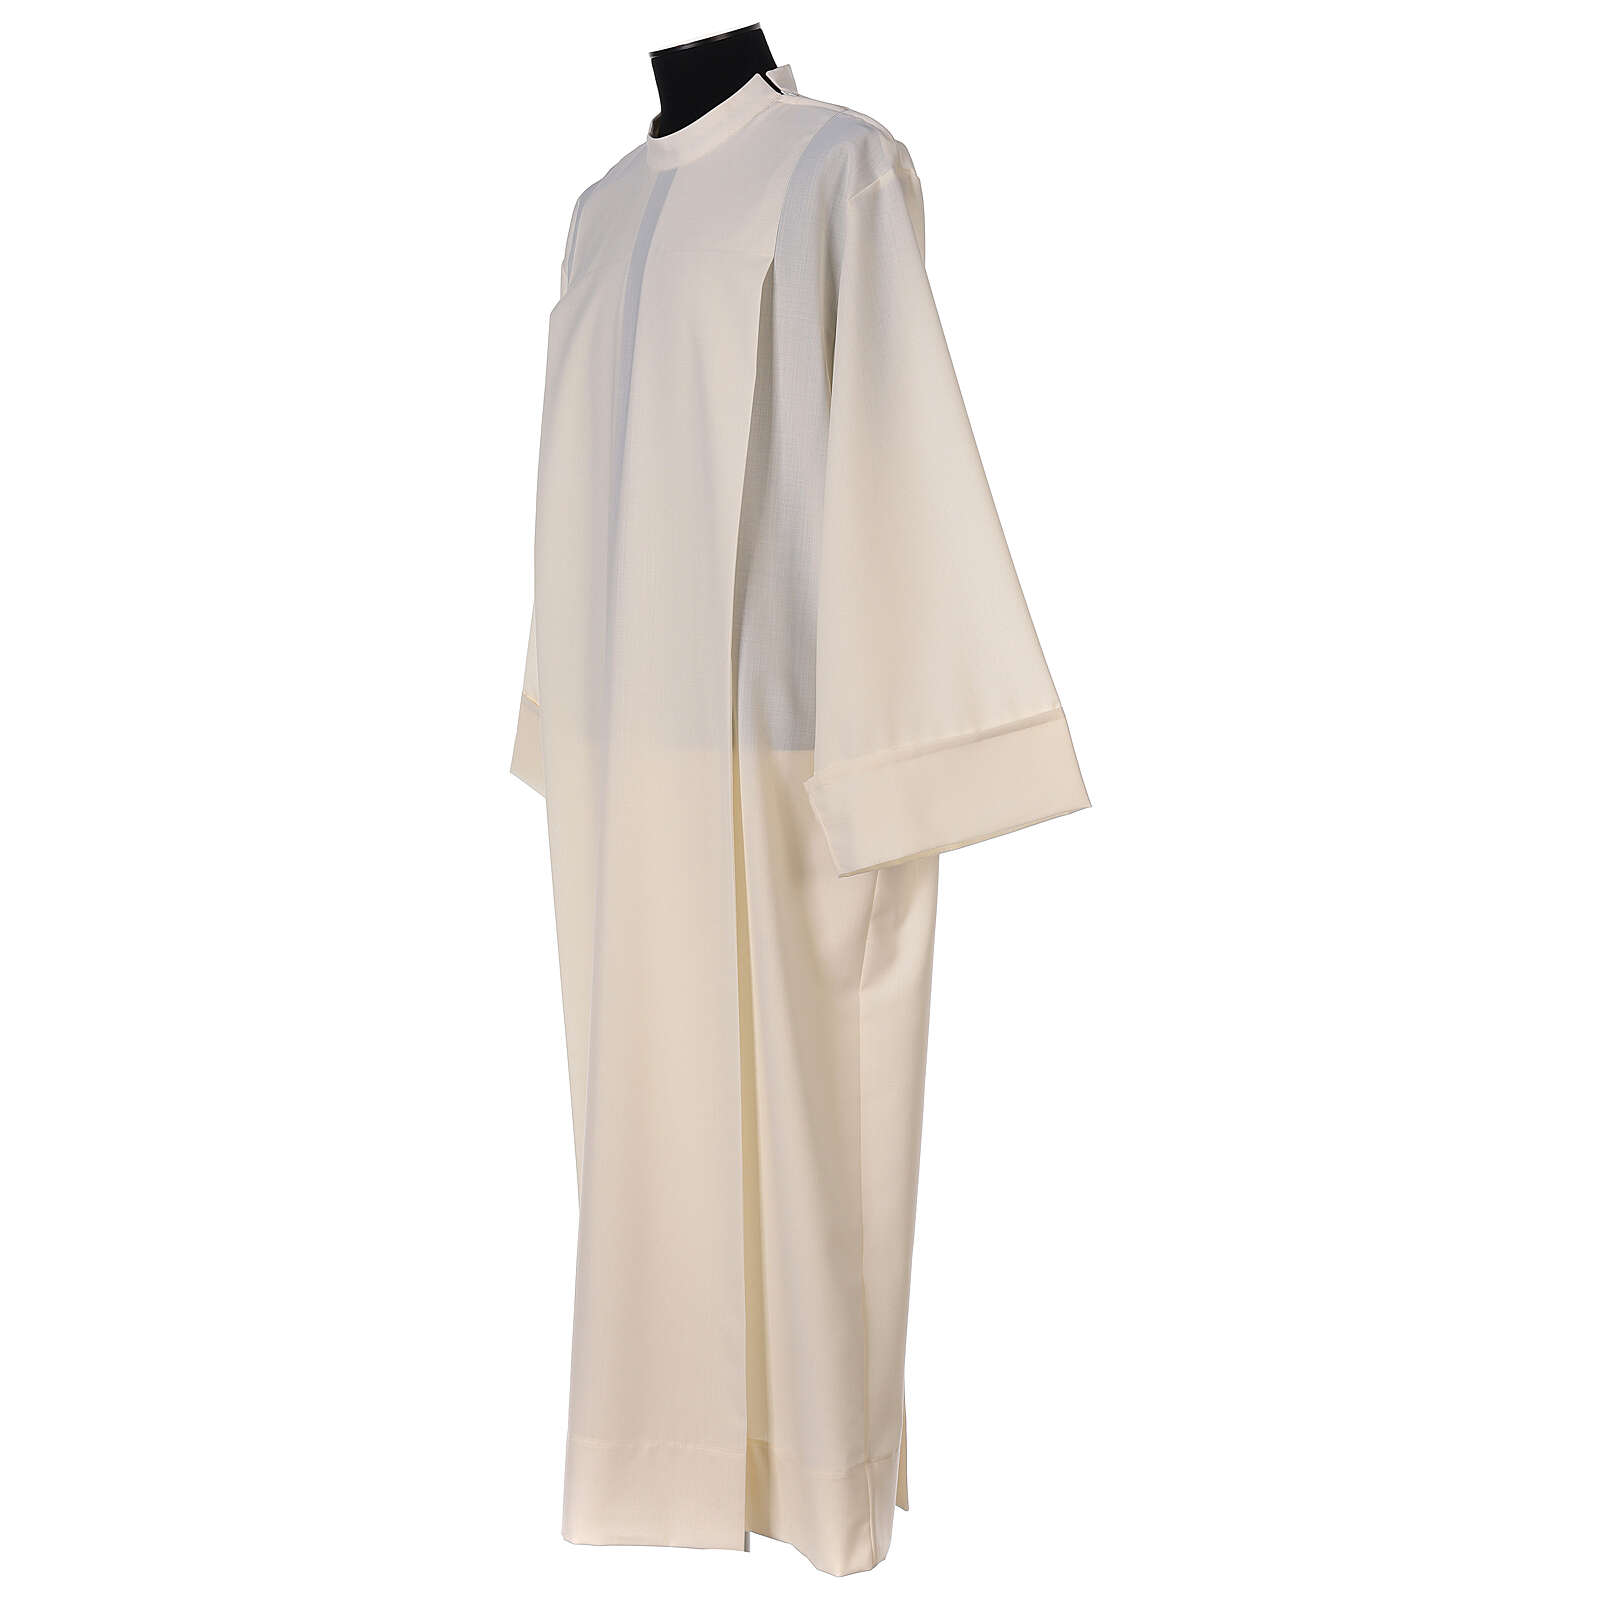 Alba marfil 55% poliéster 45% lana dos pliegues cremallera hombro 4